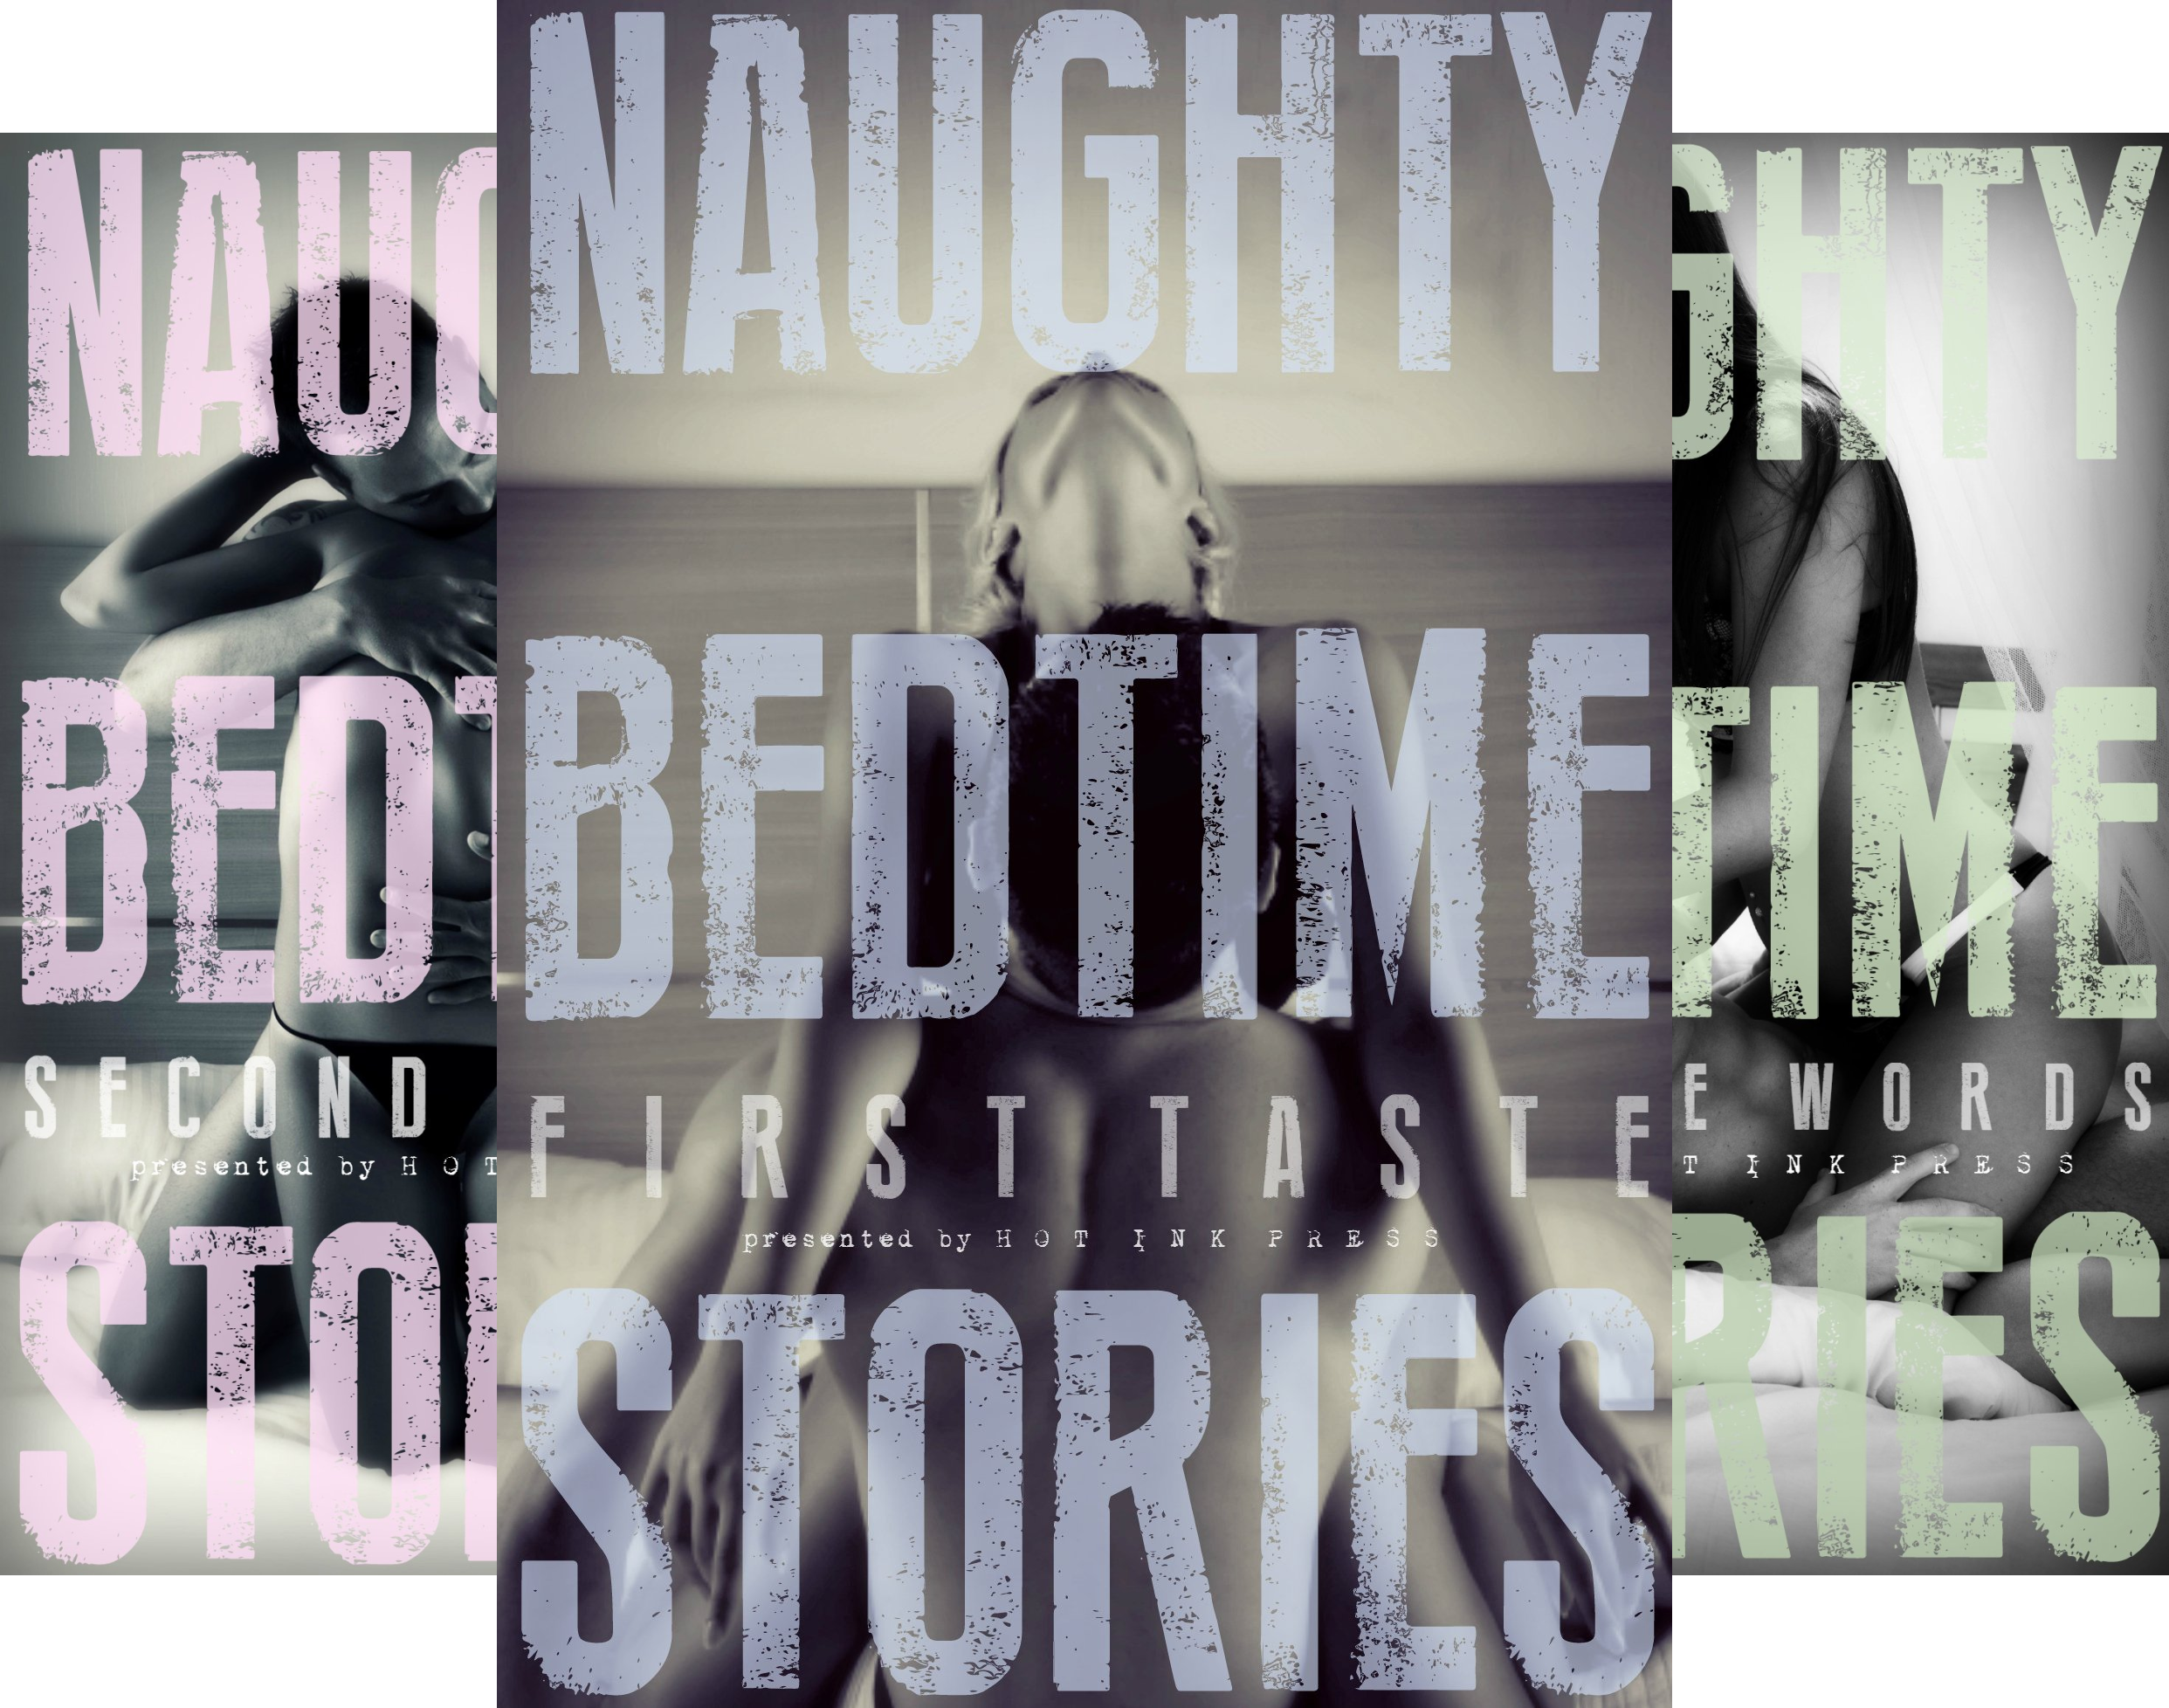 Naughty Bedtime Stories (4 Book Series)